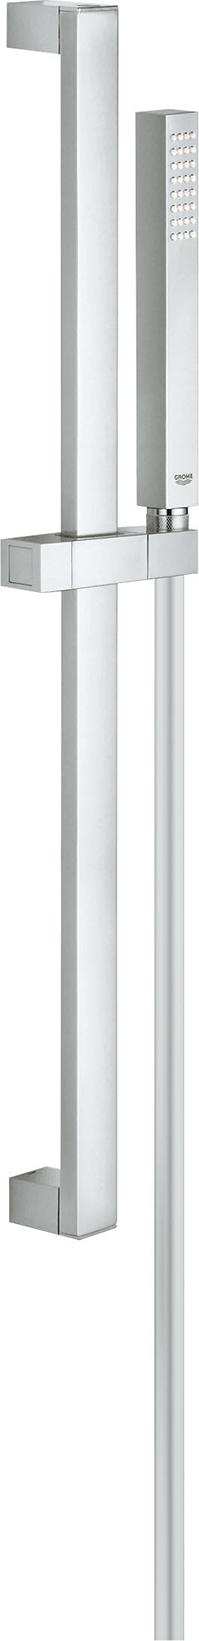 Душевой гарнитур Grohe Eurocube 27936000